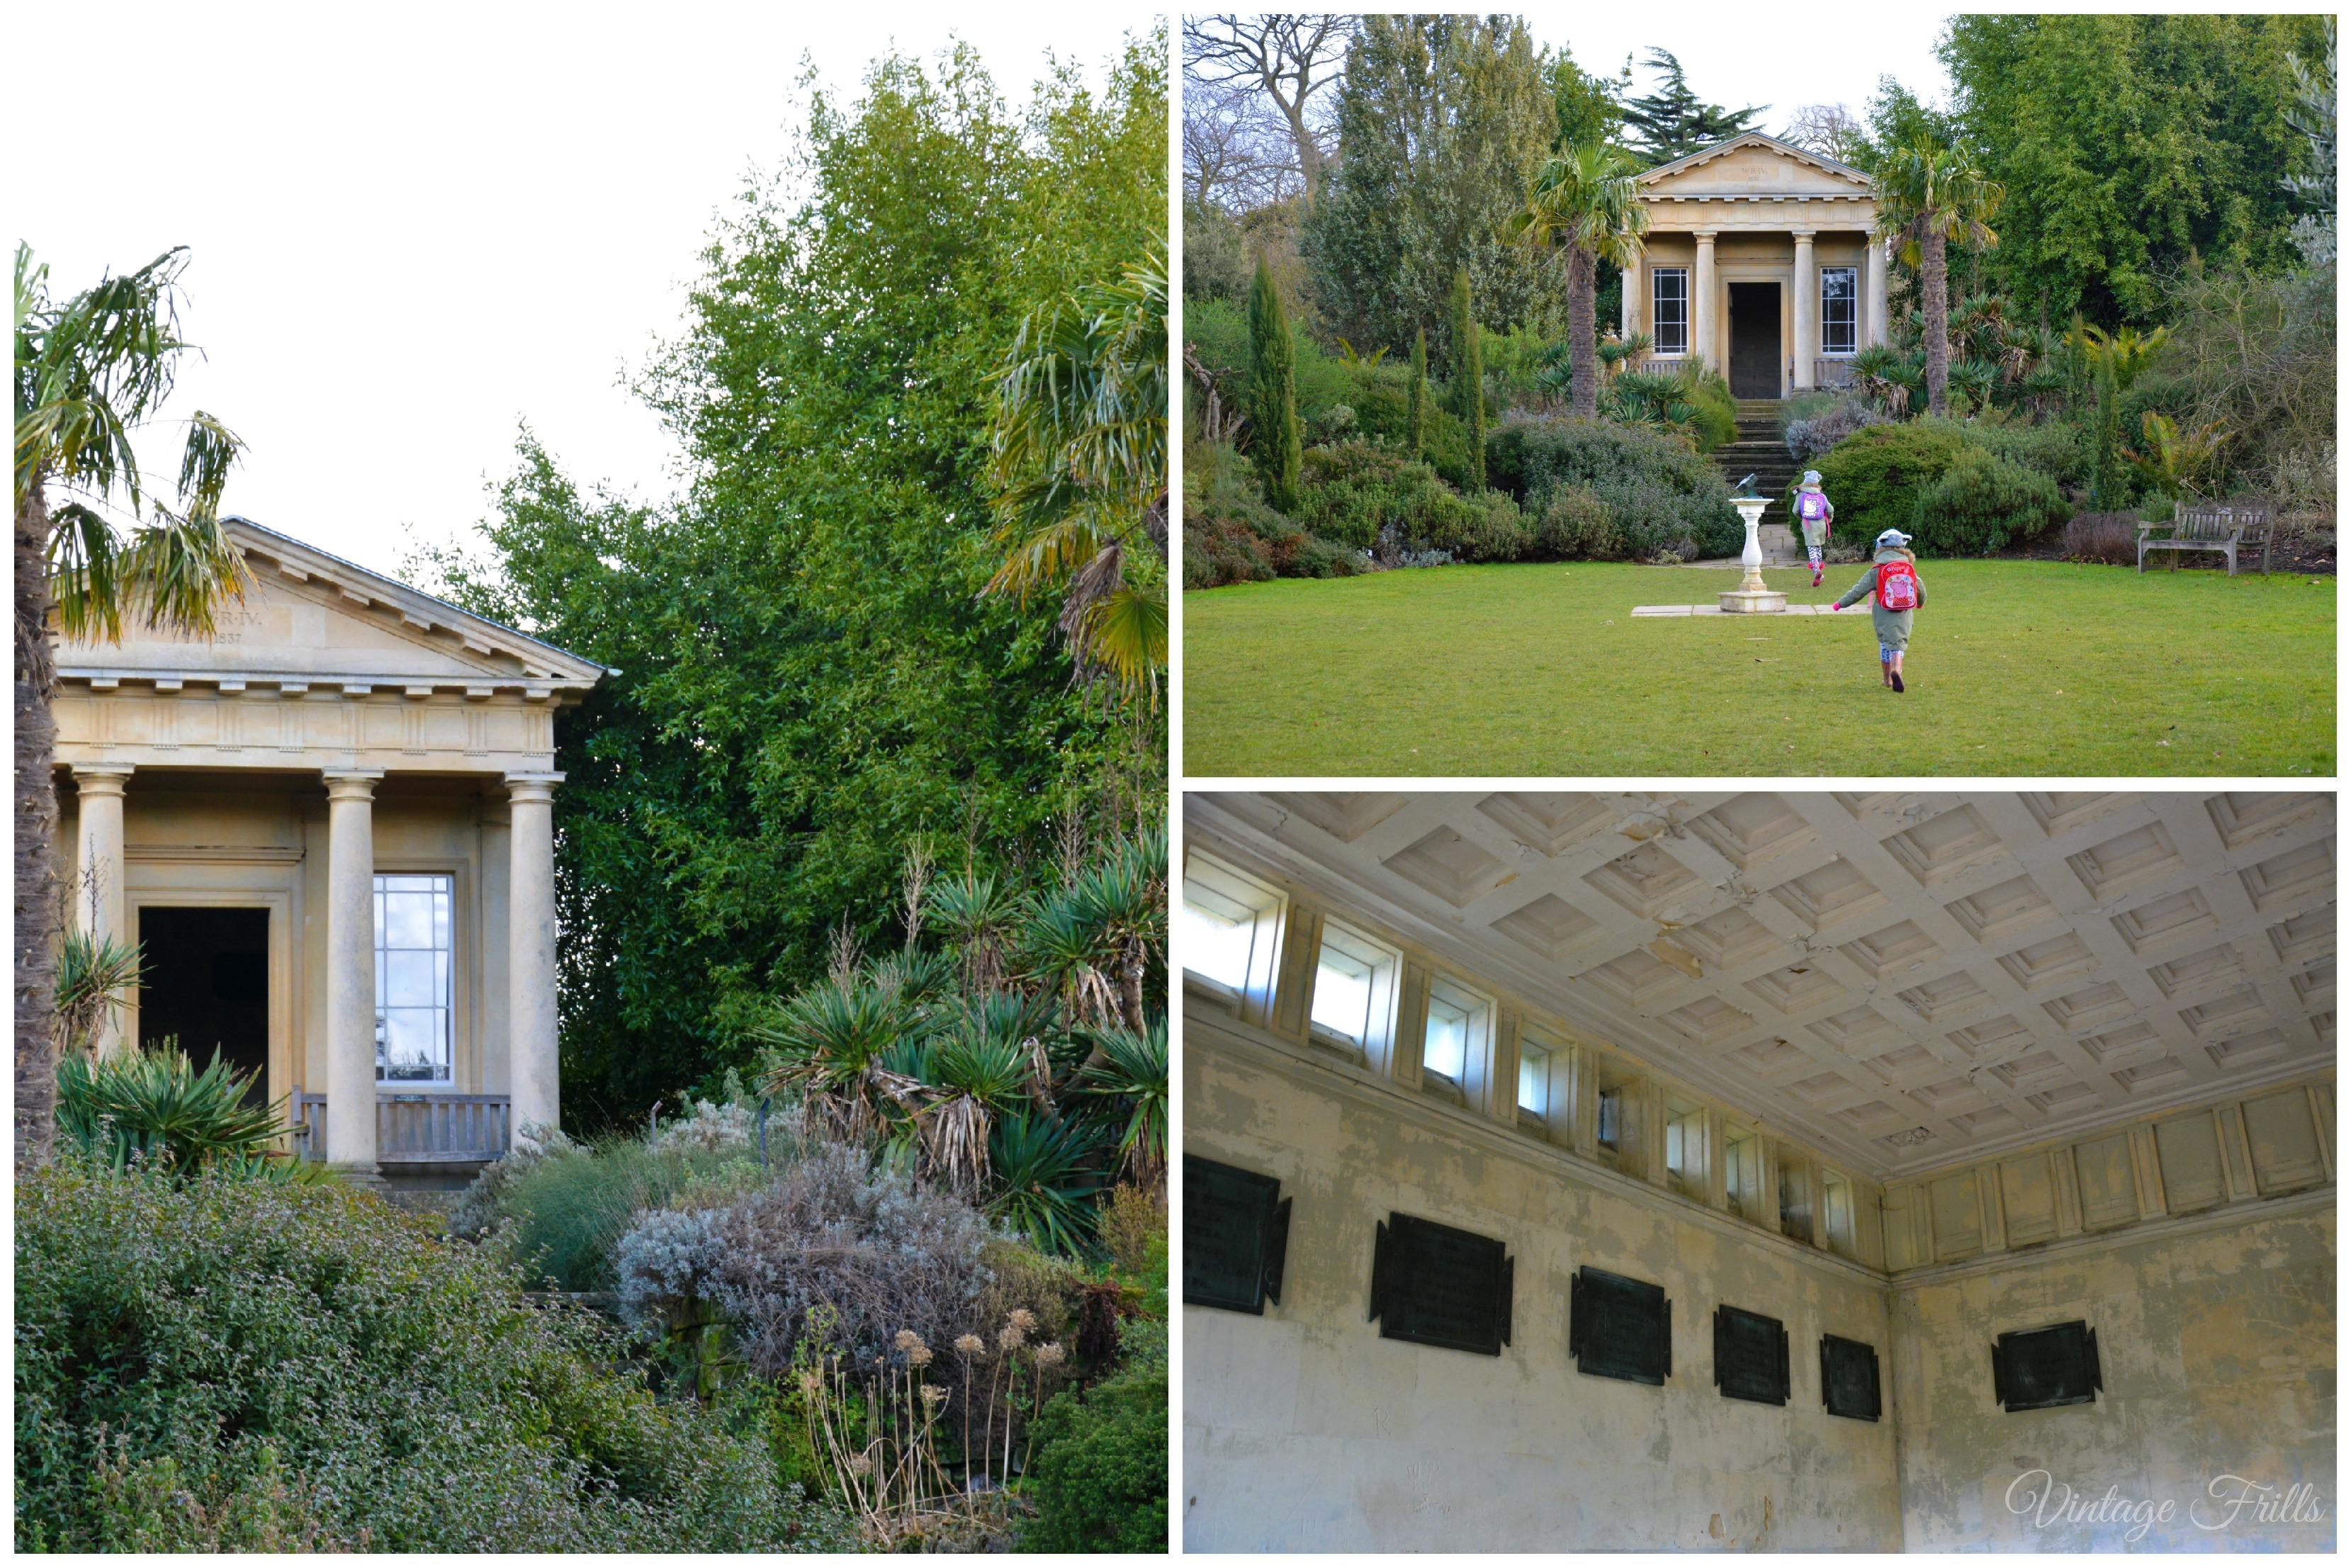 Kew Gardens King Williams Temple